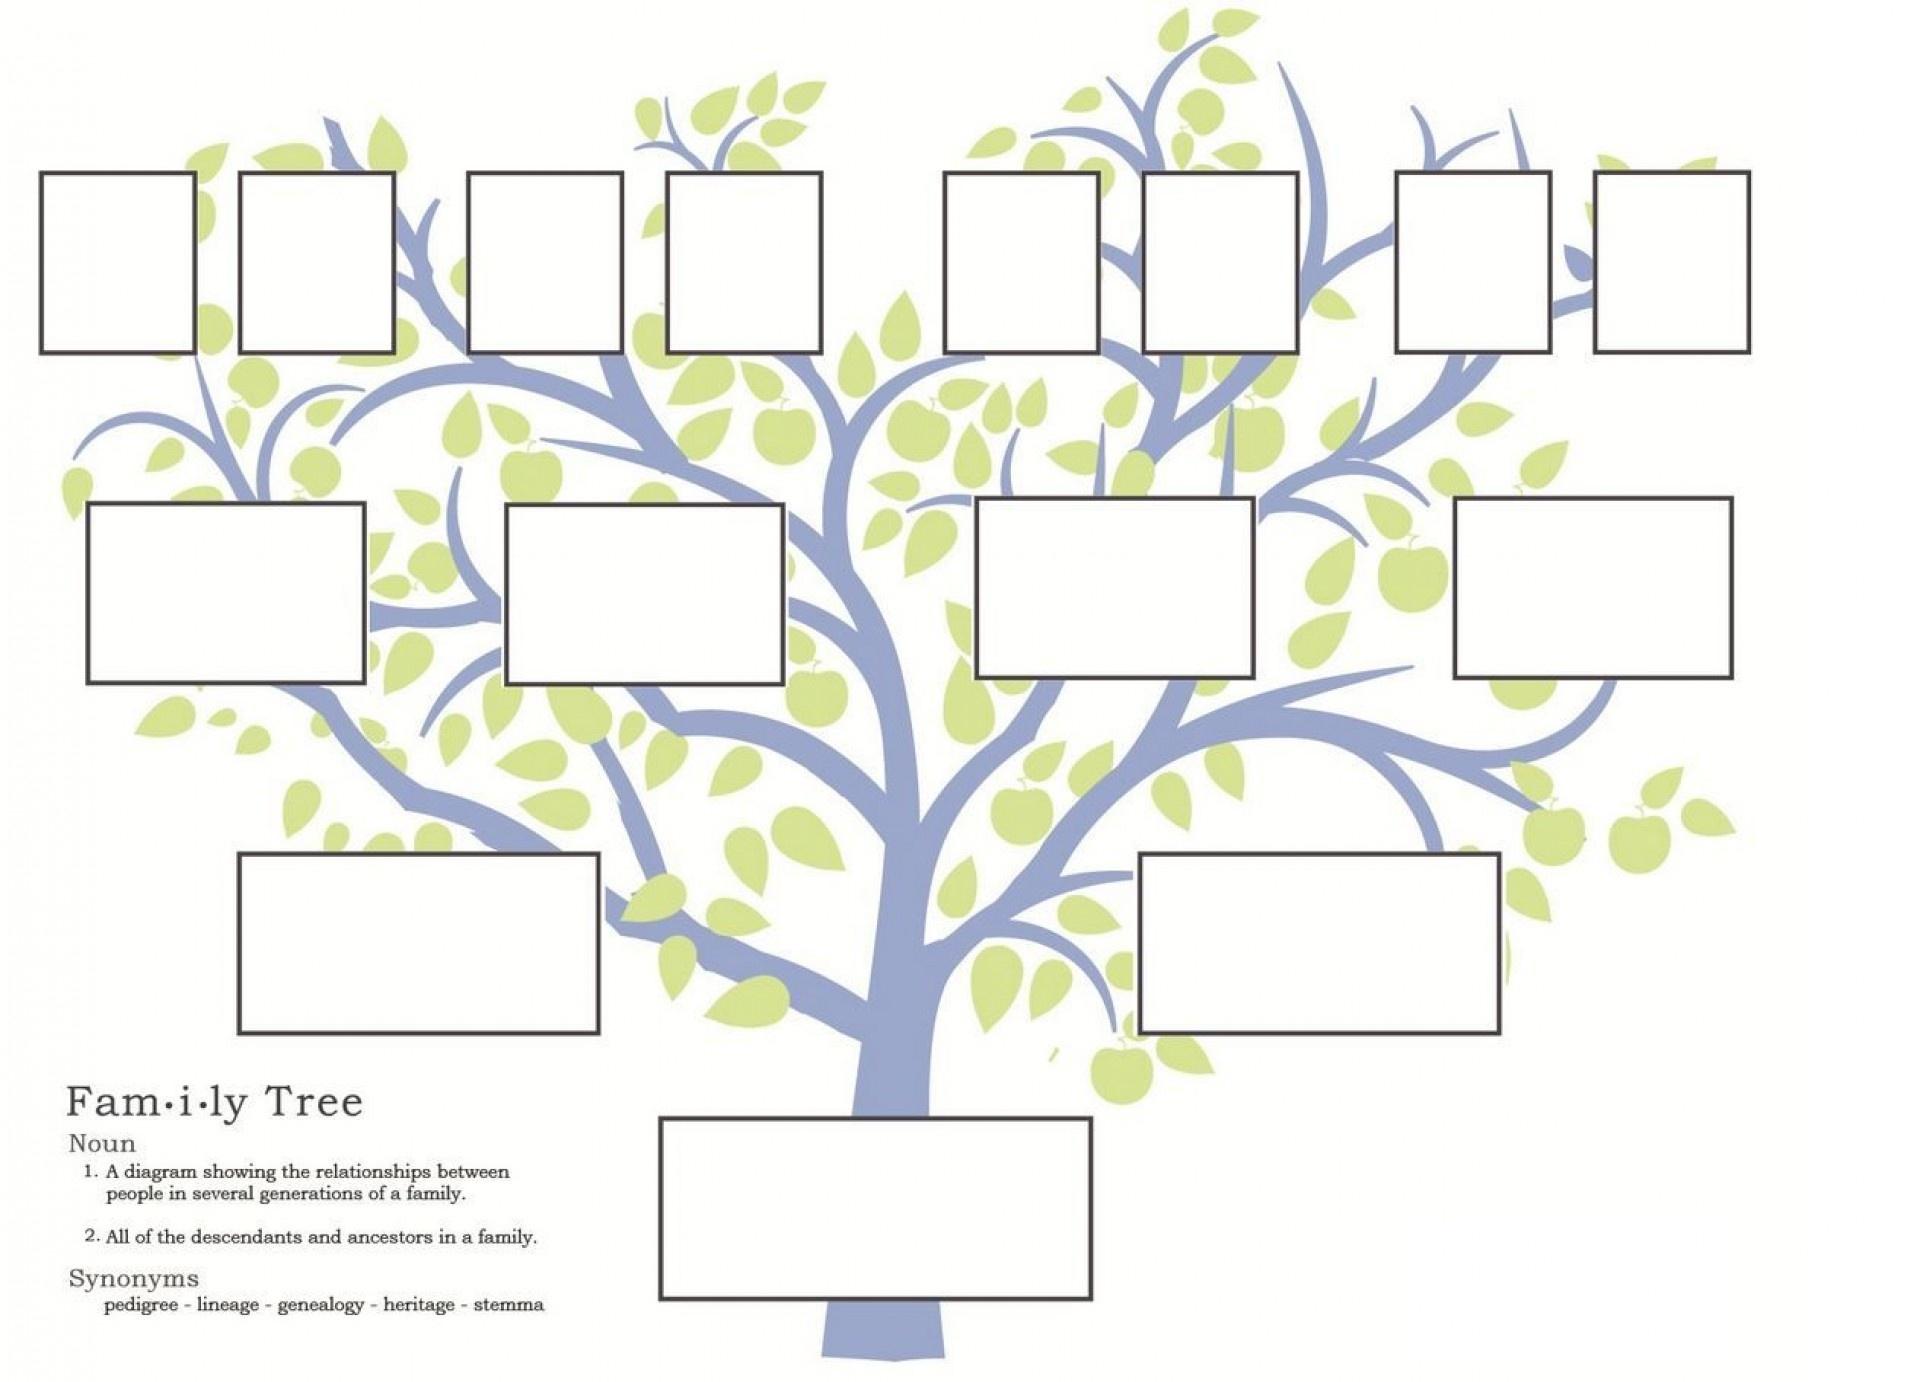 007 Free Family Tree Templates Pedigree Chart Template Sensational - Free Printable Family Tree Template 4 Generations